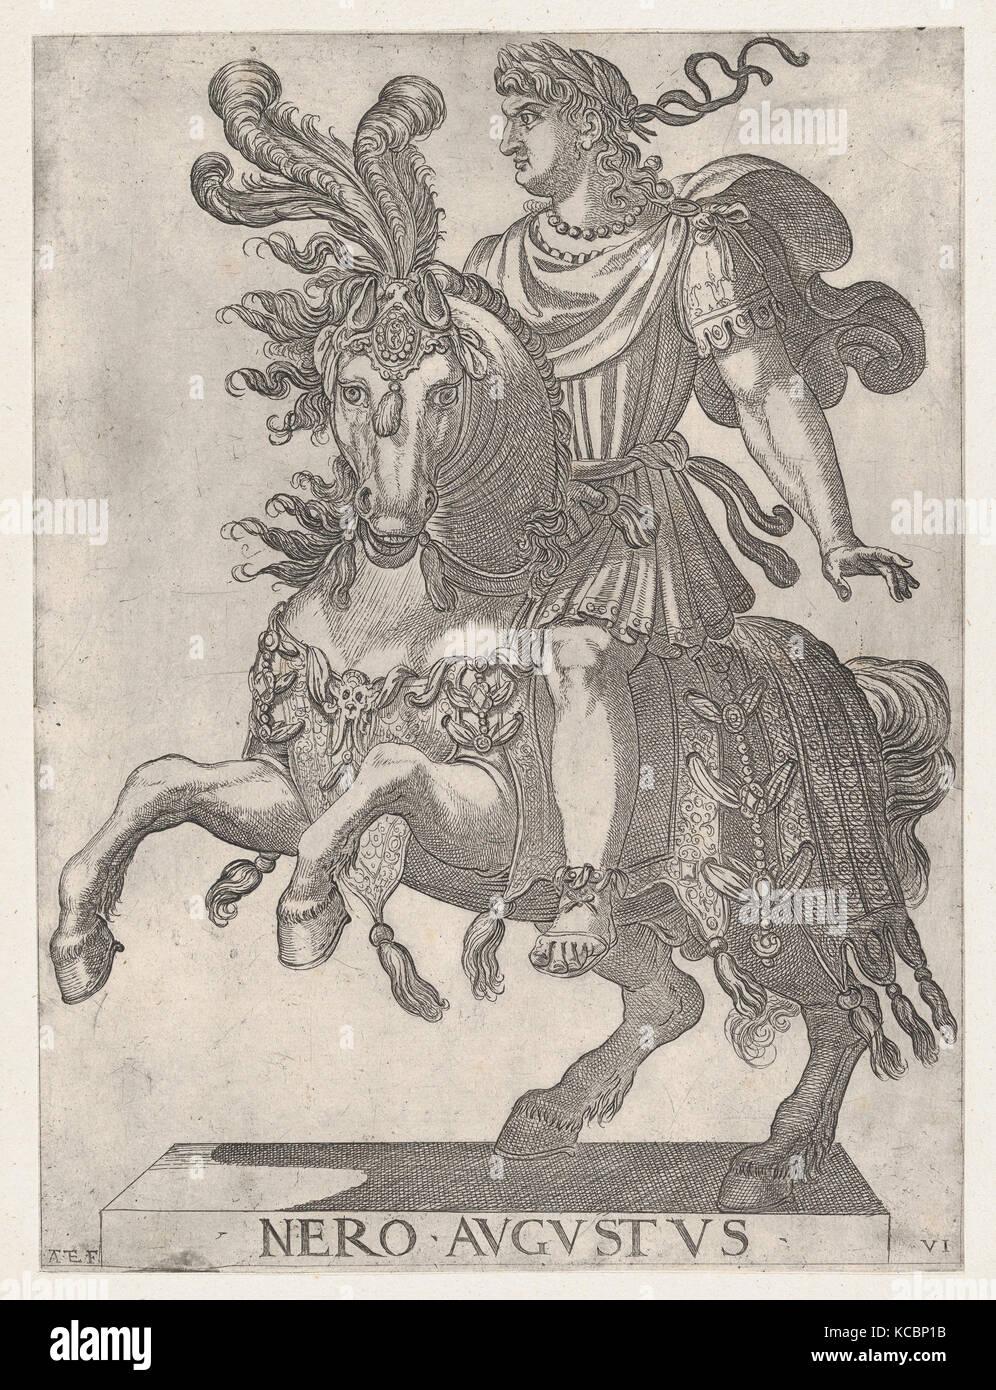 Plate 6: Emperor Nero on Horseback, from ' The First Twelve Roman Caesars', Antonio Tempesta, 1596 - Stock Image